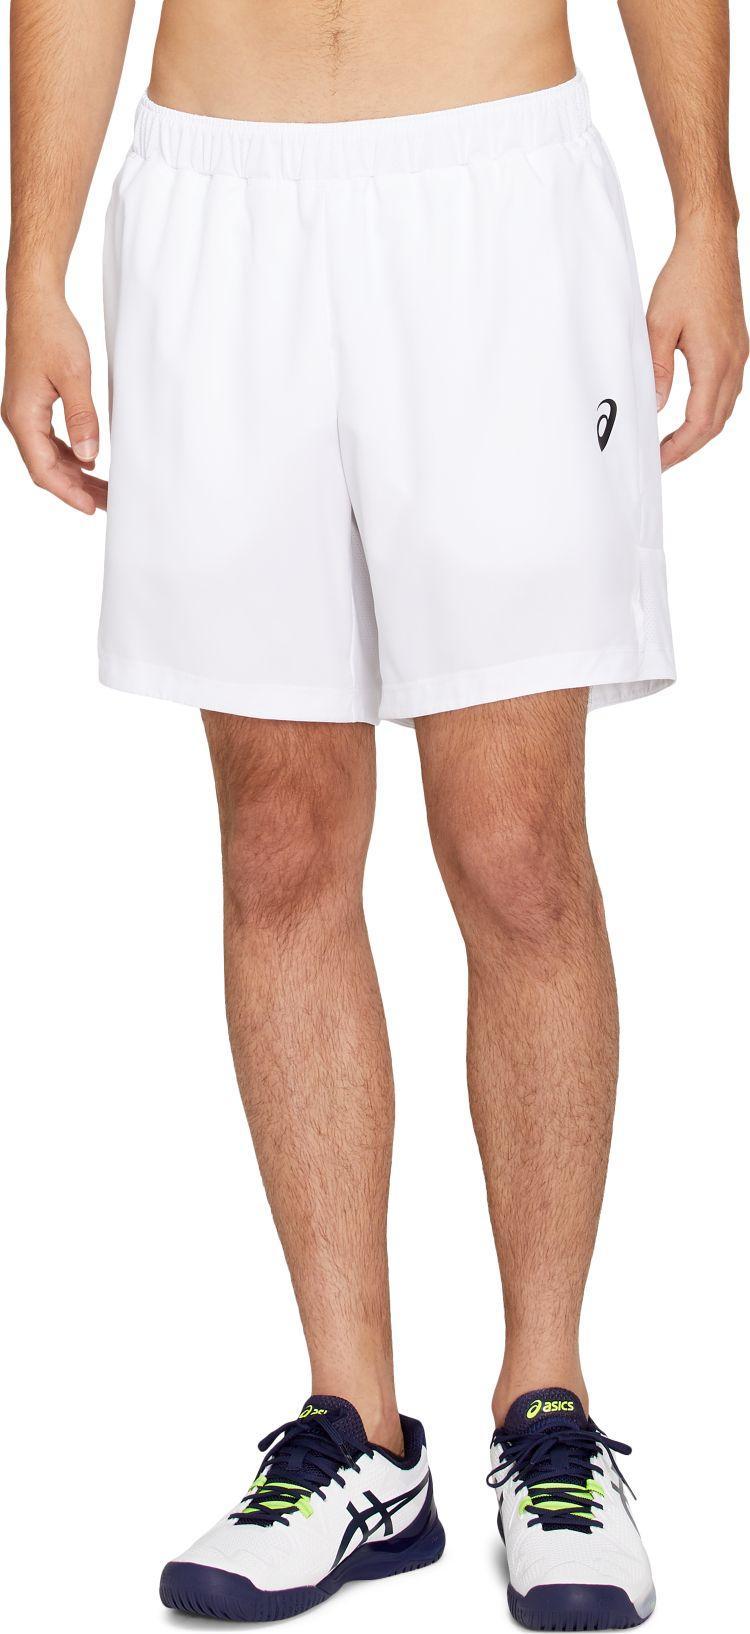 Pantalon Asics Club 7 blanco